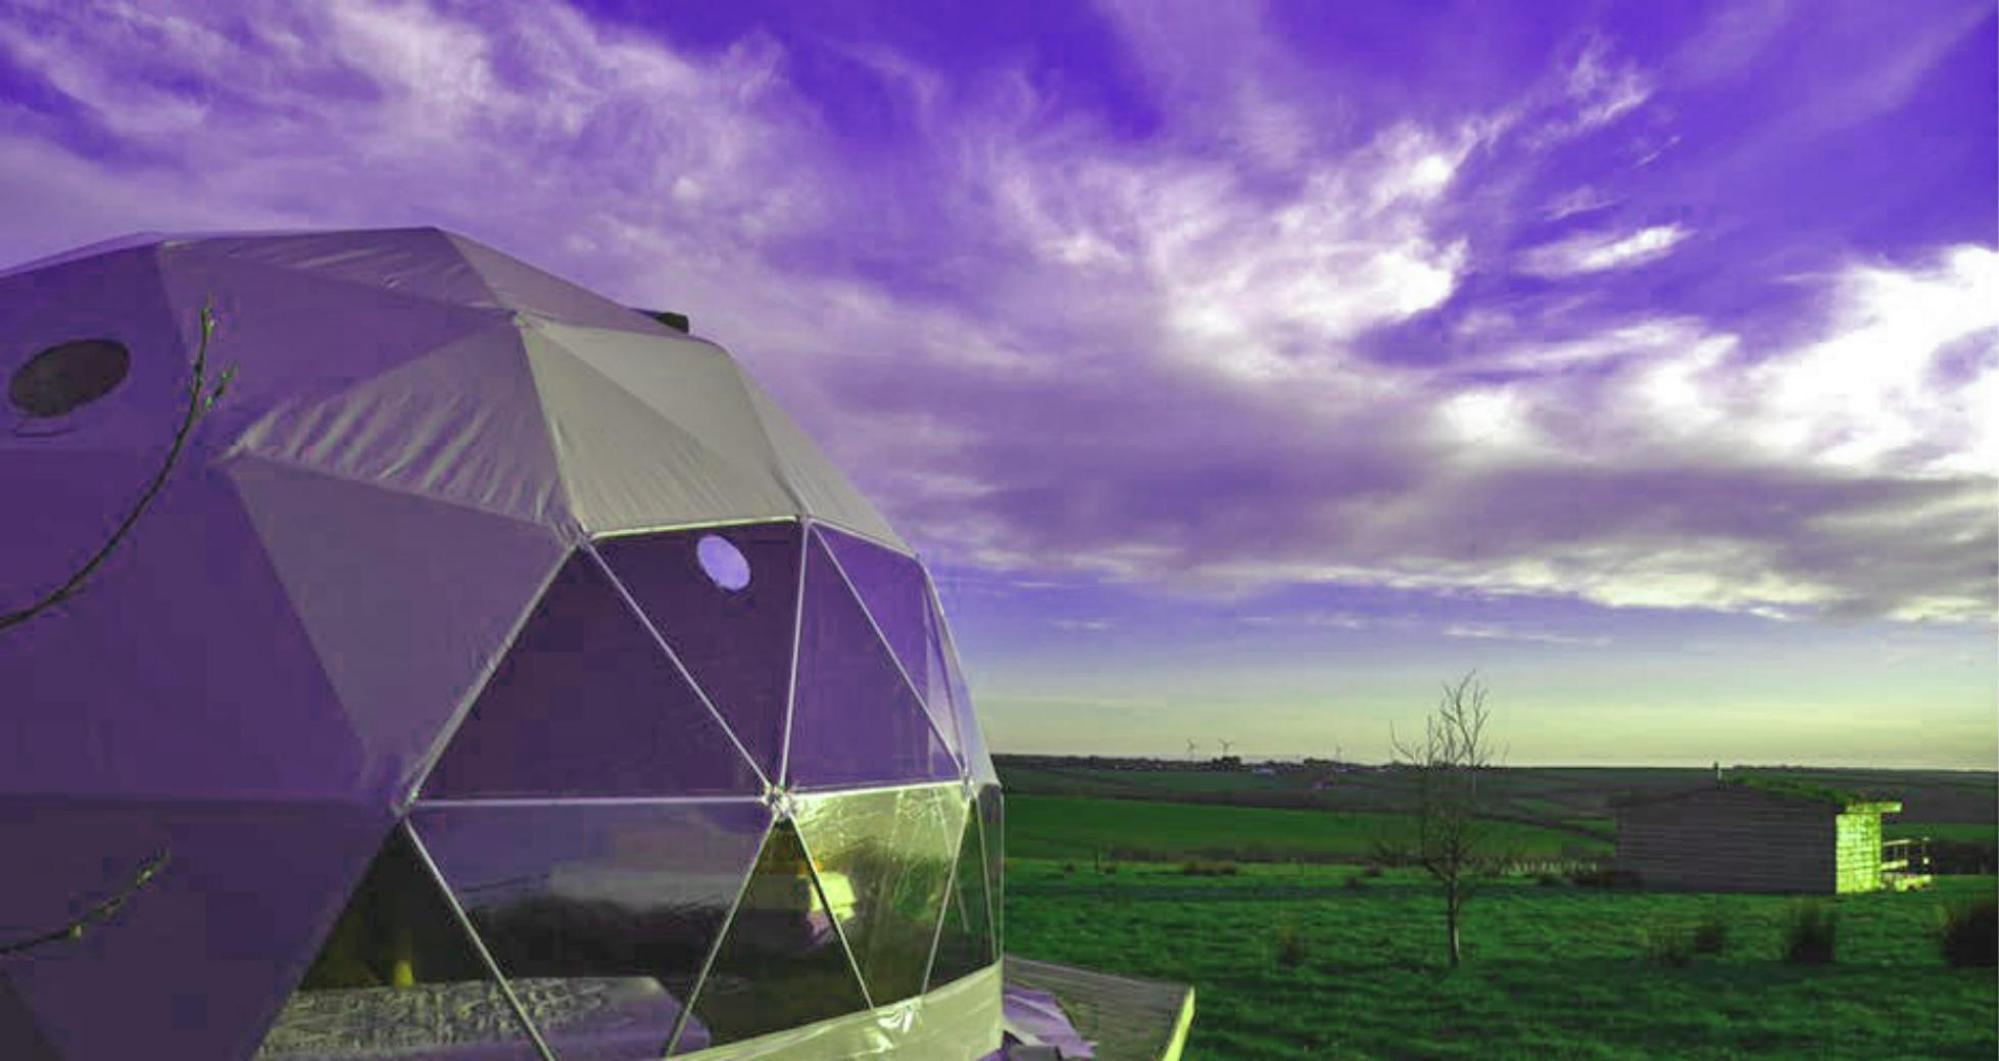 Glamping in Bideford – Cool Camping